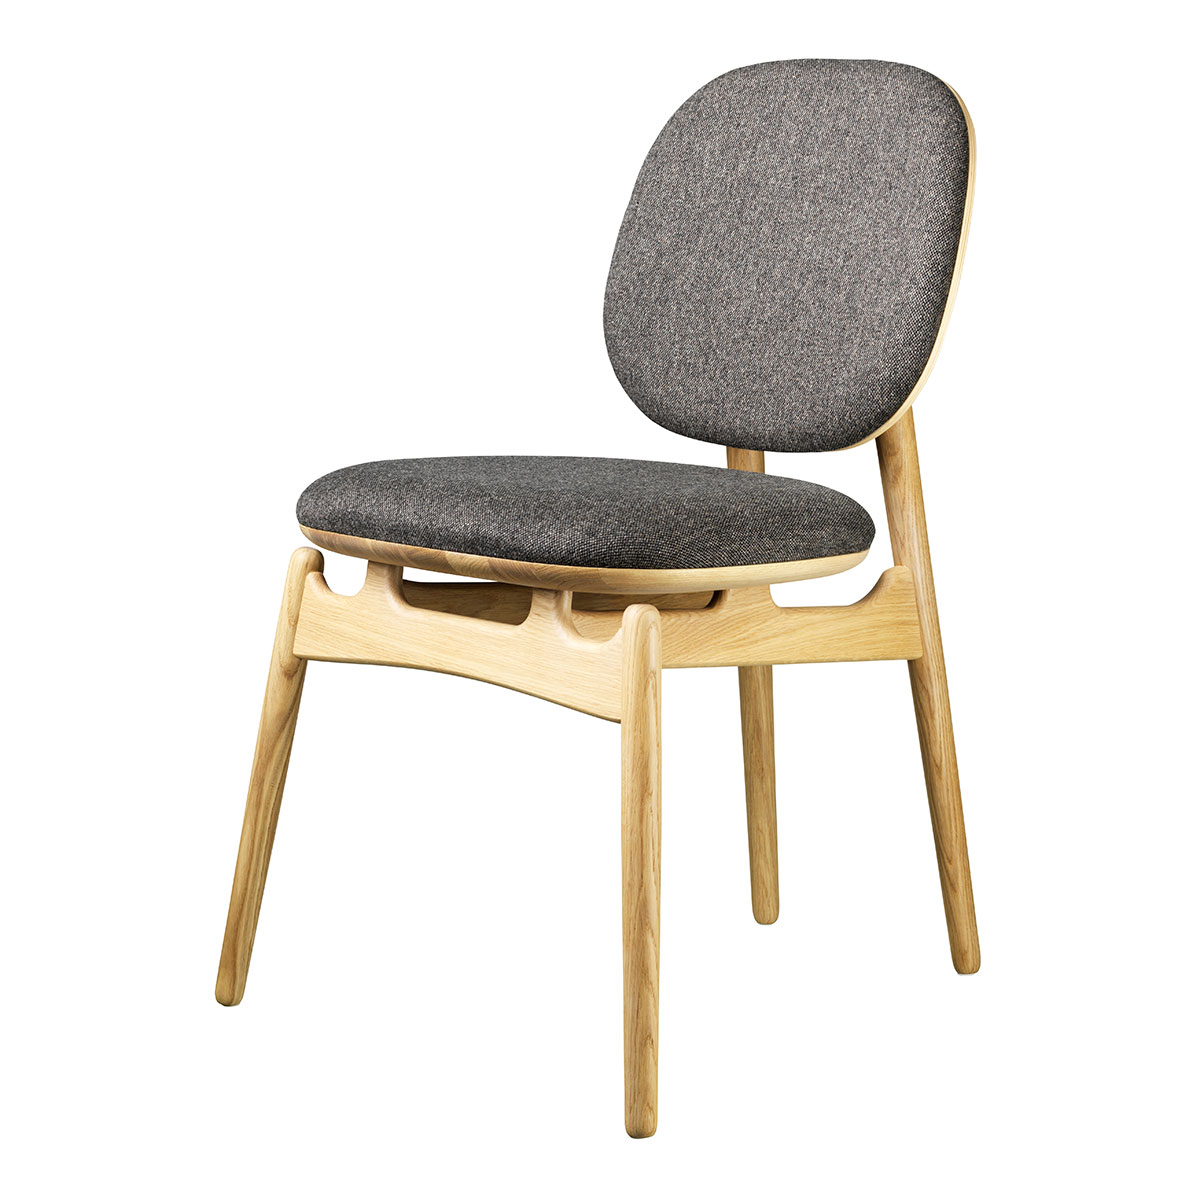 Image of   Hans-Christian Bauer stol - J161 PoSpiSto - Eg/gråt tekstil